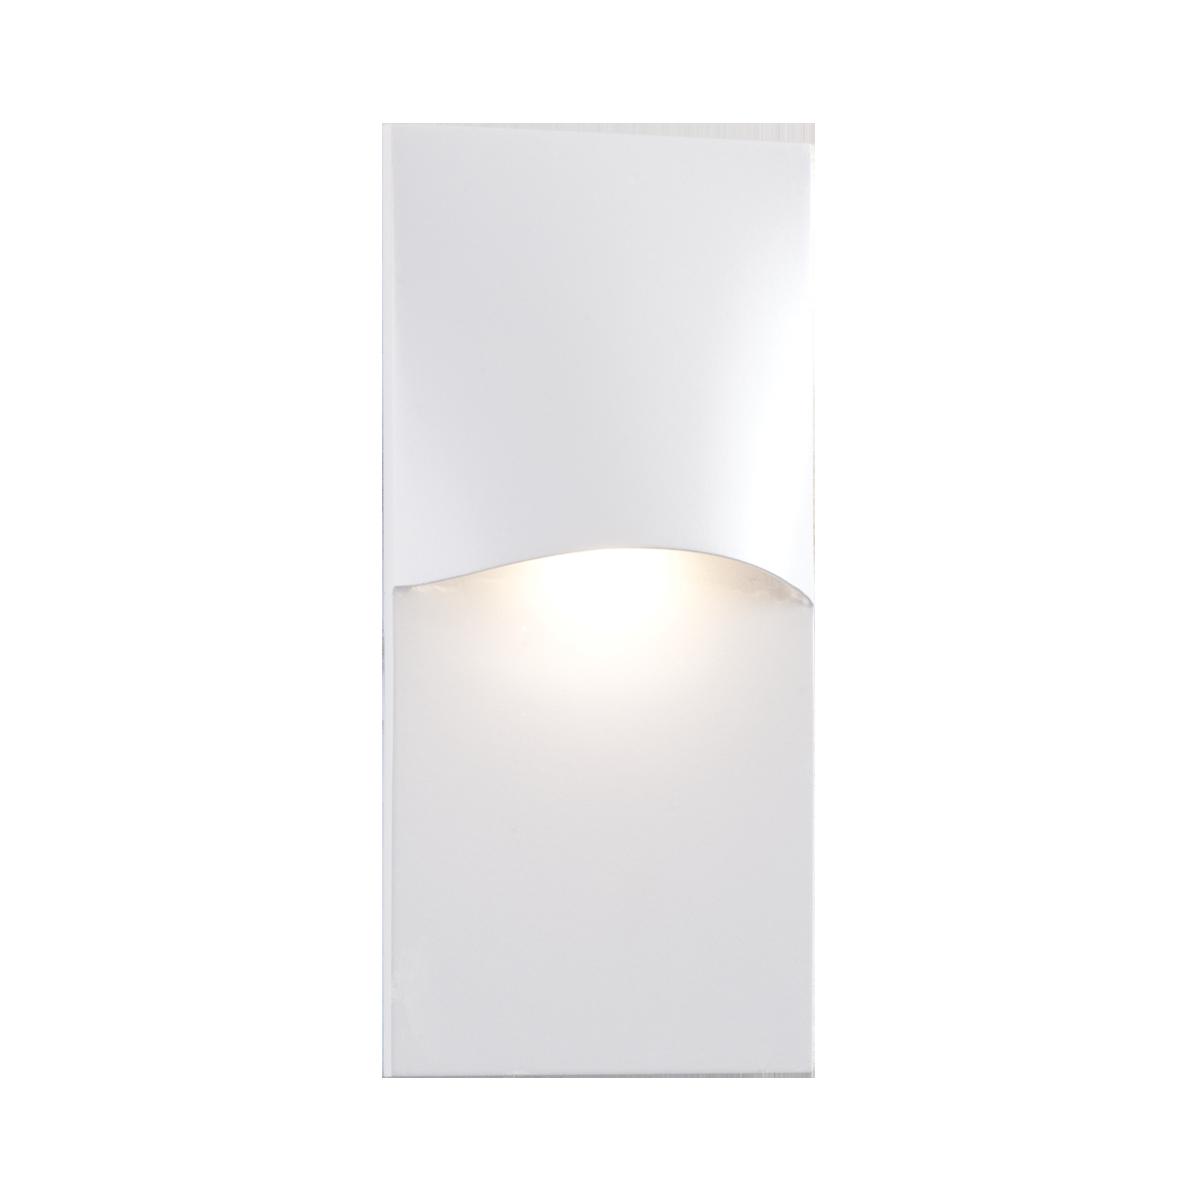 "4-3 - 4"" x 2-1 - 2"" LED Step Light, White Finish"